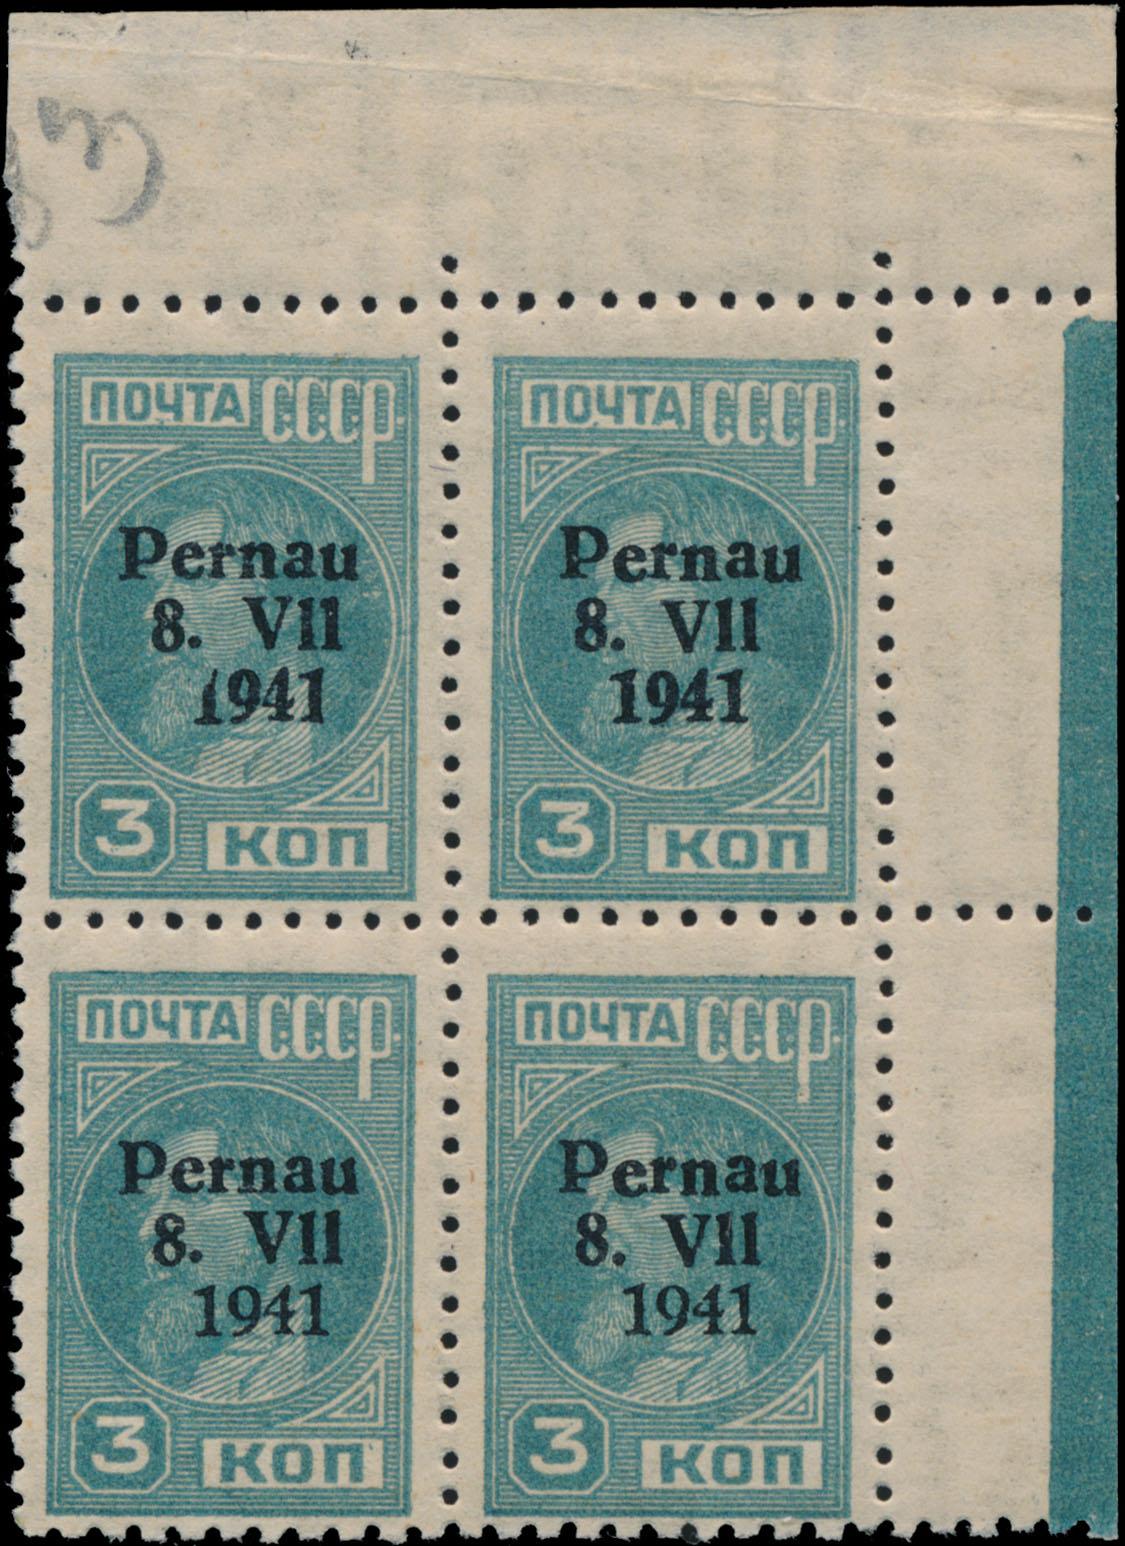 Lot 299 - germany. occupation issues of the world war ii Estland (Estonia) - Pernau (Parnu) -  Raritan Stamps Inc. Live Bidding Auction #84